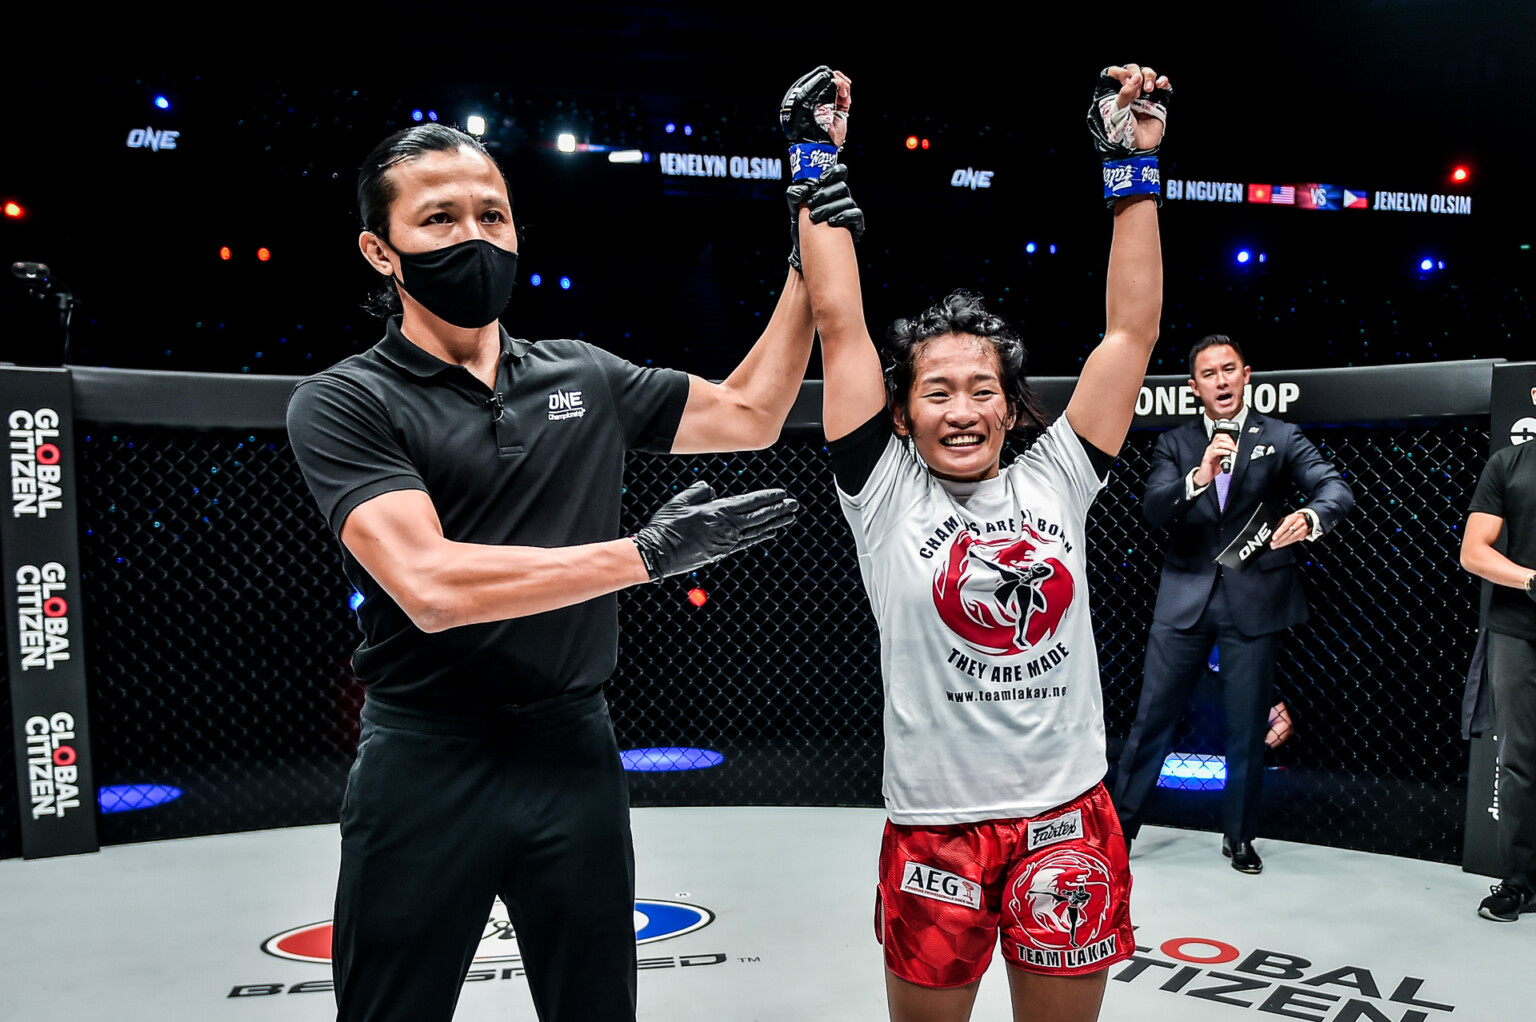 Jenelyn Olsim scores unanimous decision over Bi Nguyen